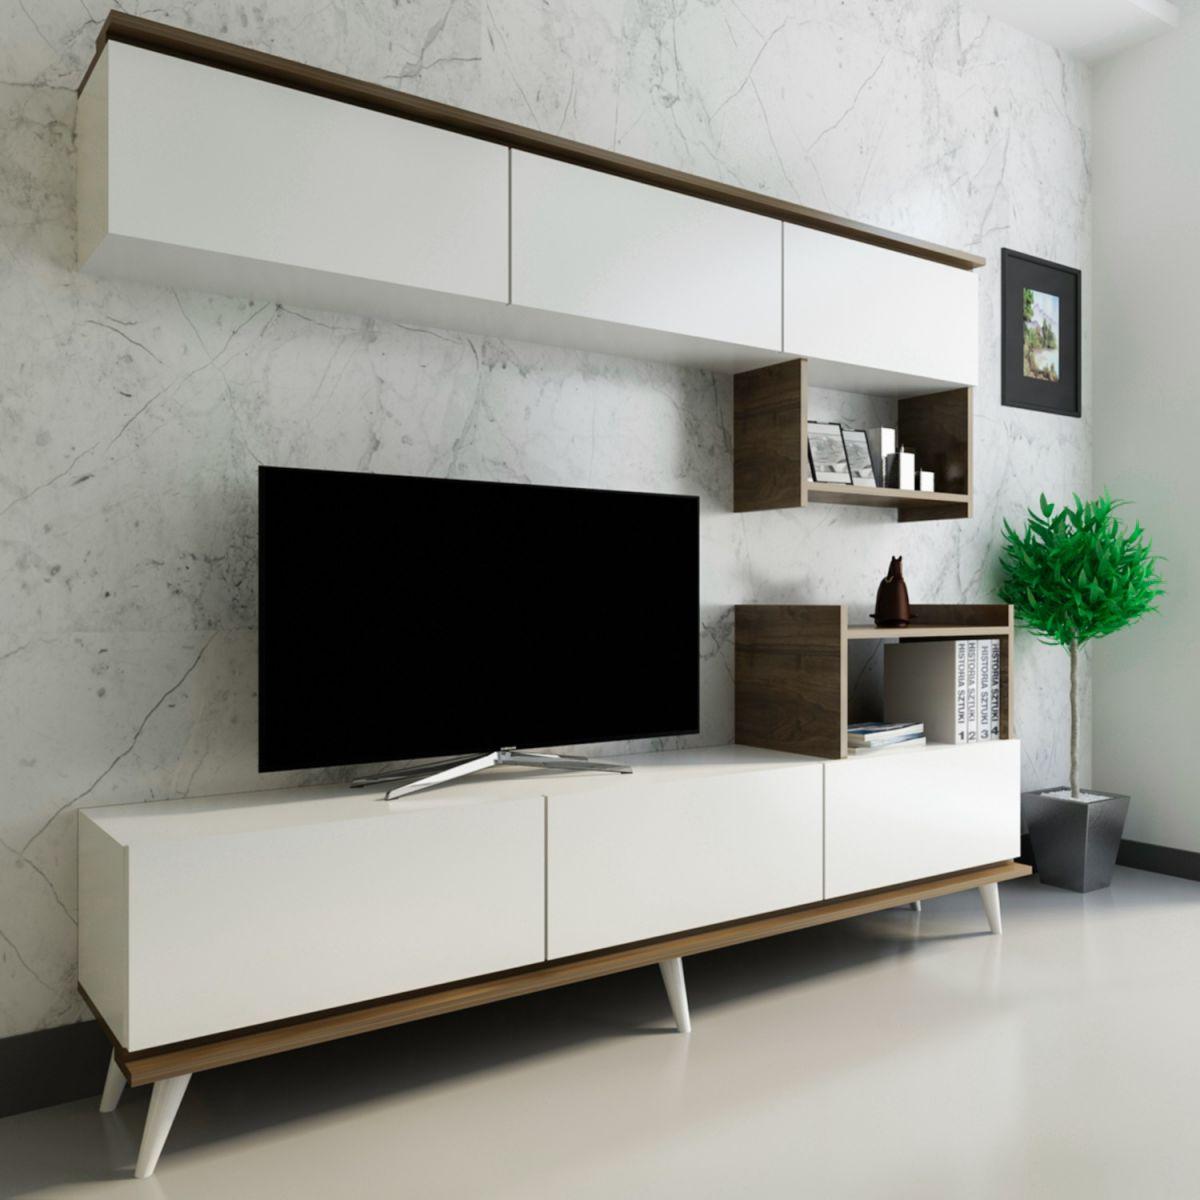 Ansamblu mobilier 2 piese living, Nocce Homs, 180.4 x 33.1 x 72 cm, alb/nuc